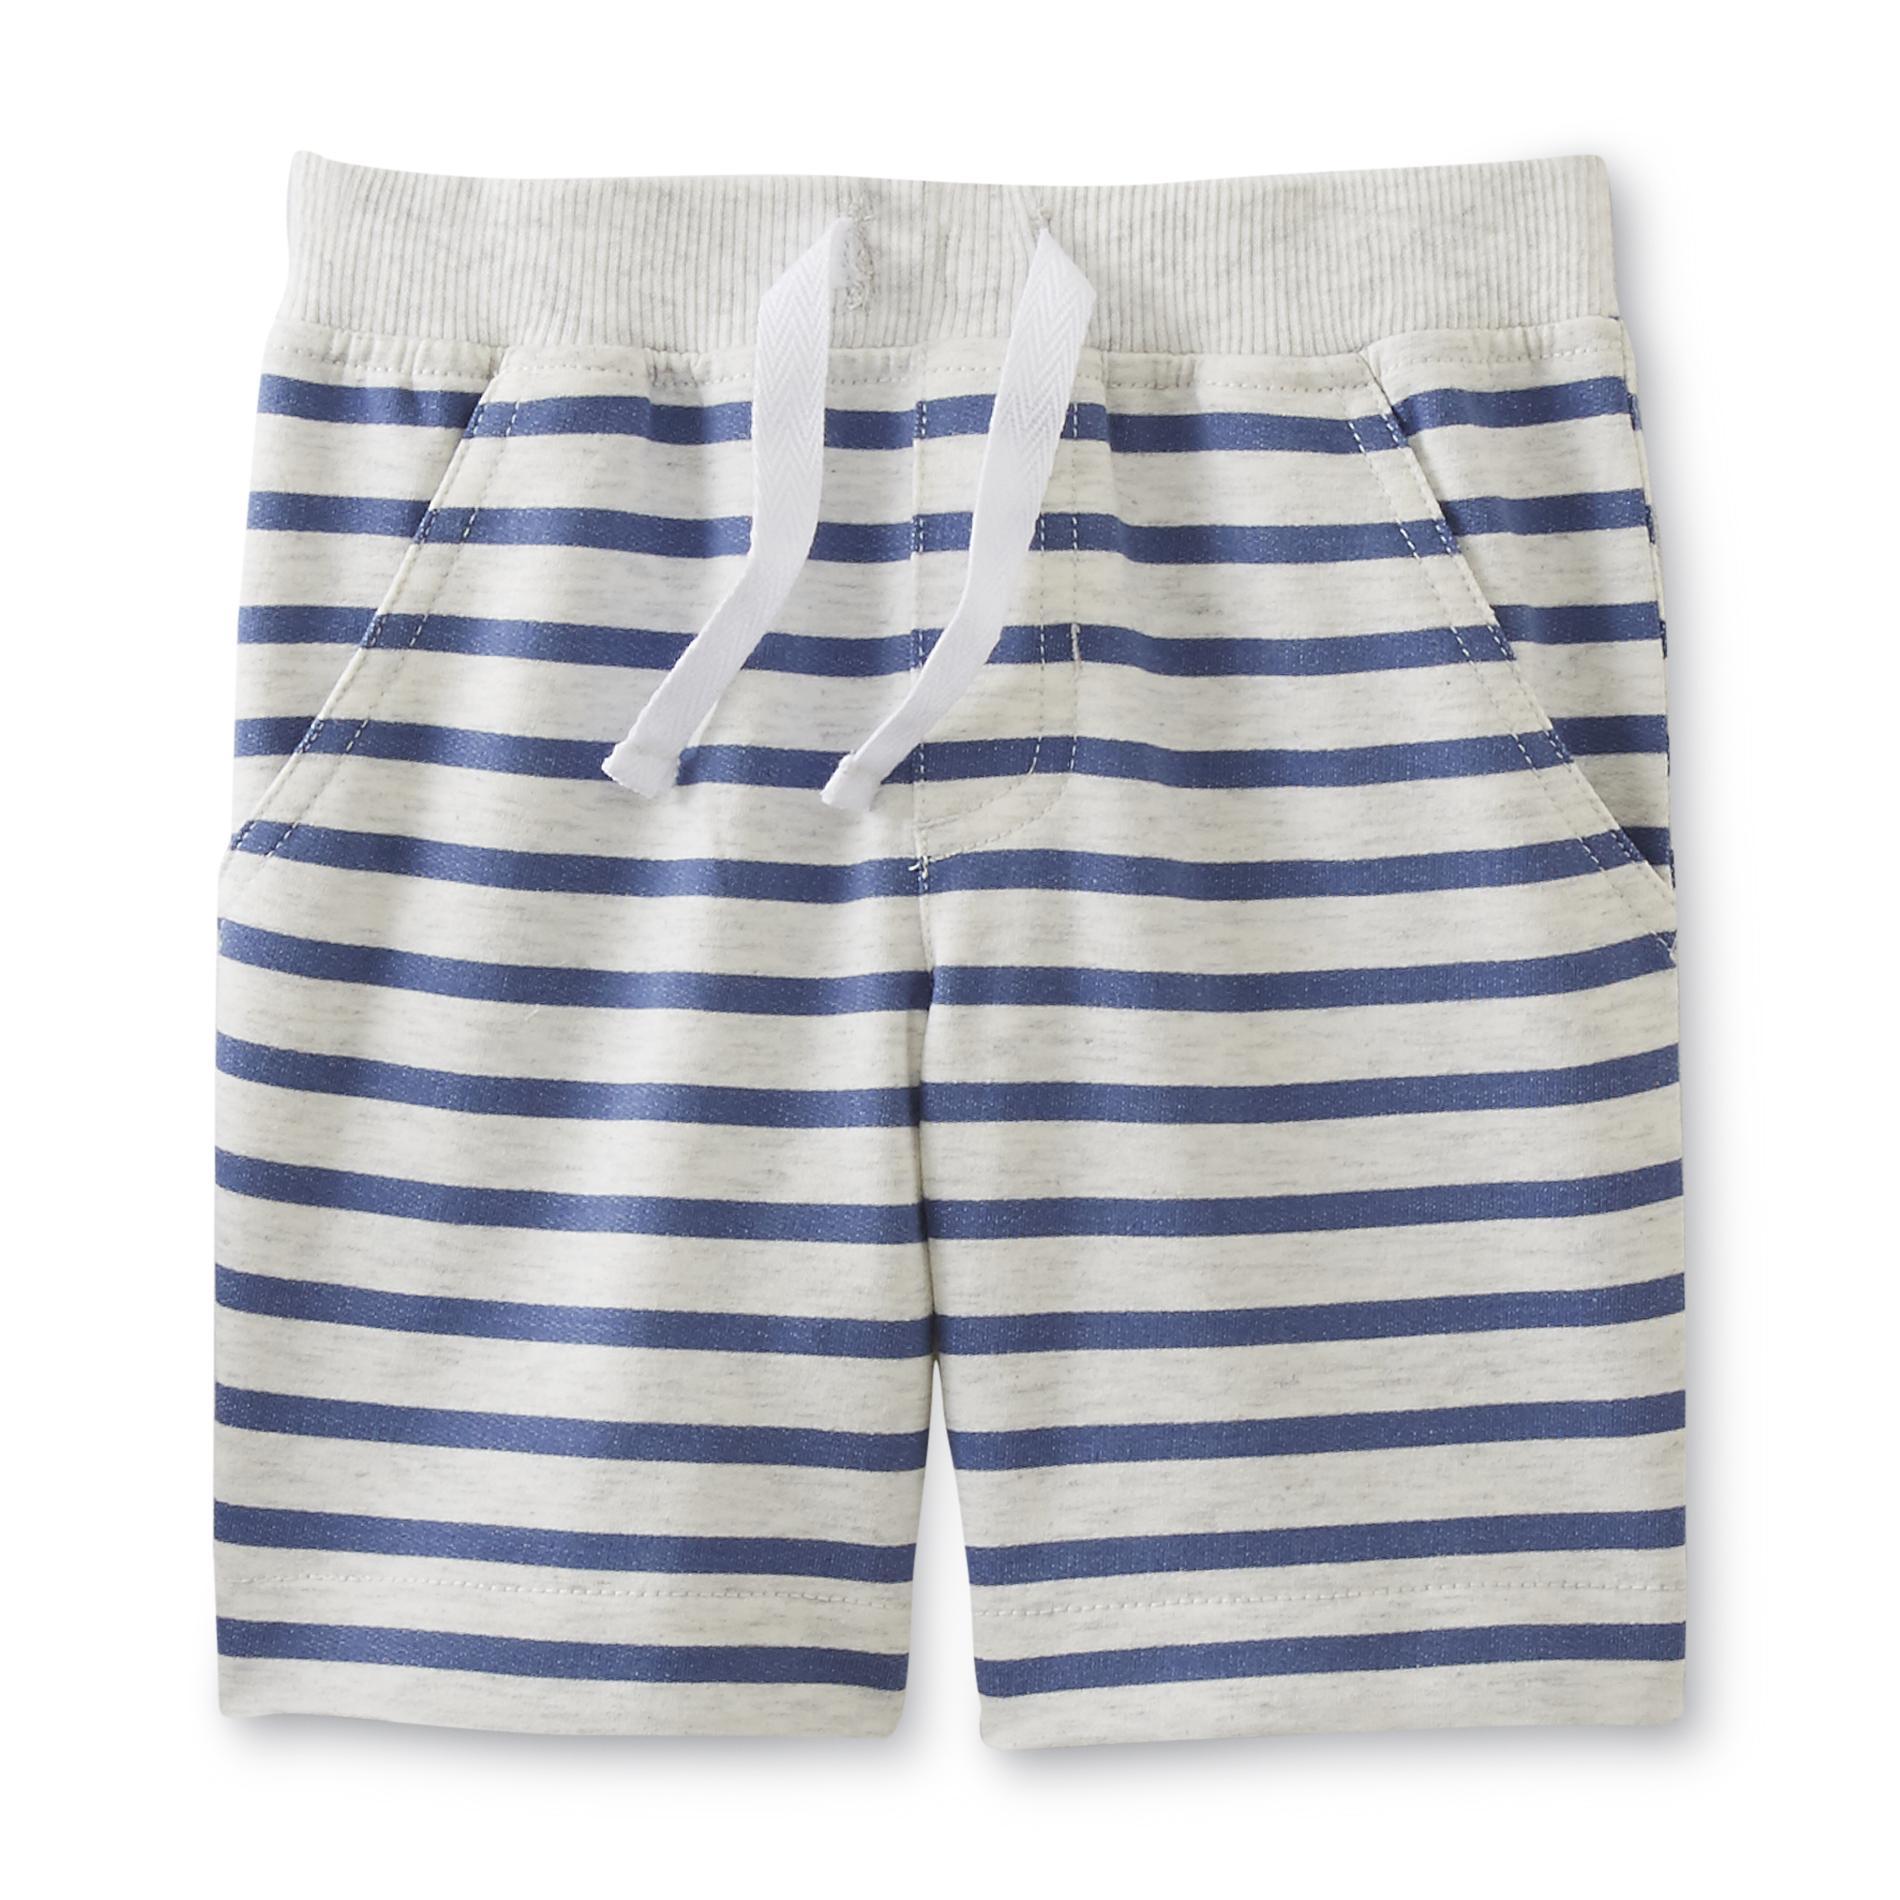 WonderKids Infant & Toddler Boy's Shorts - Striped